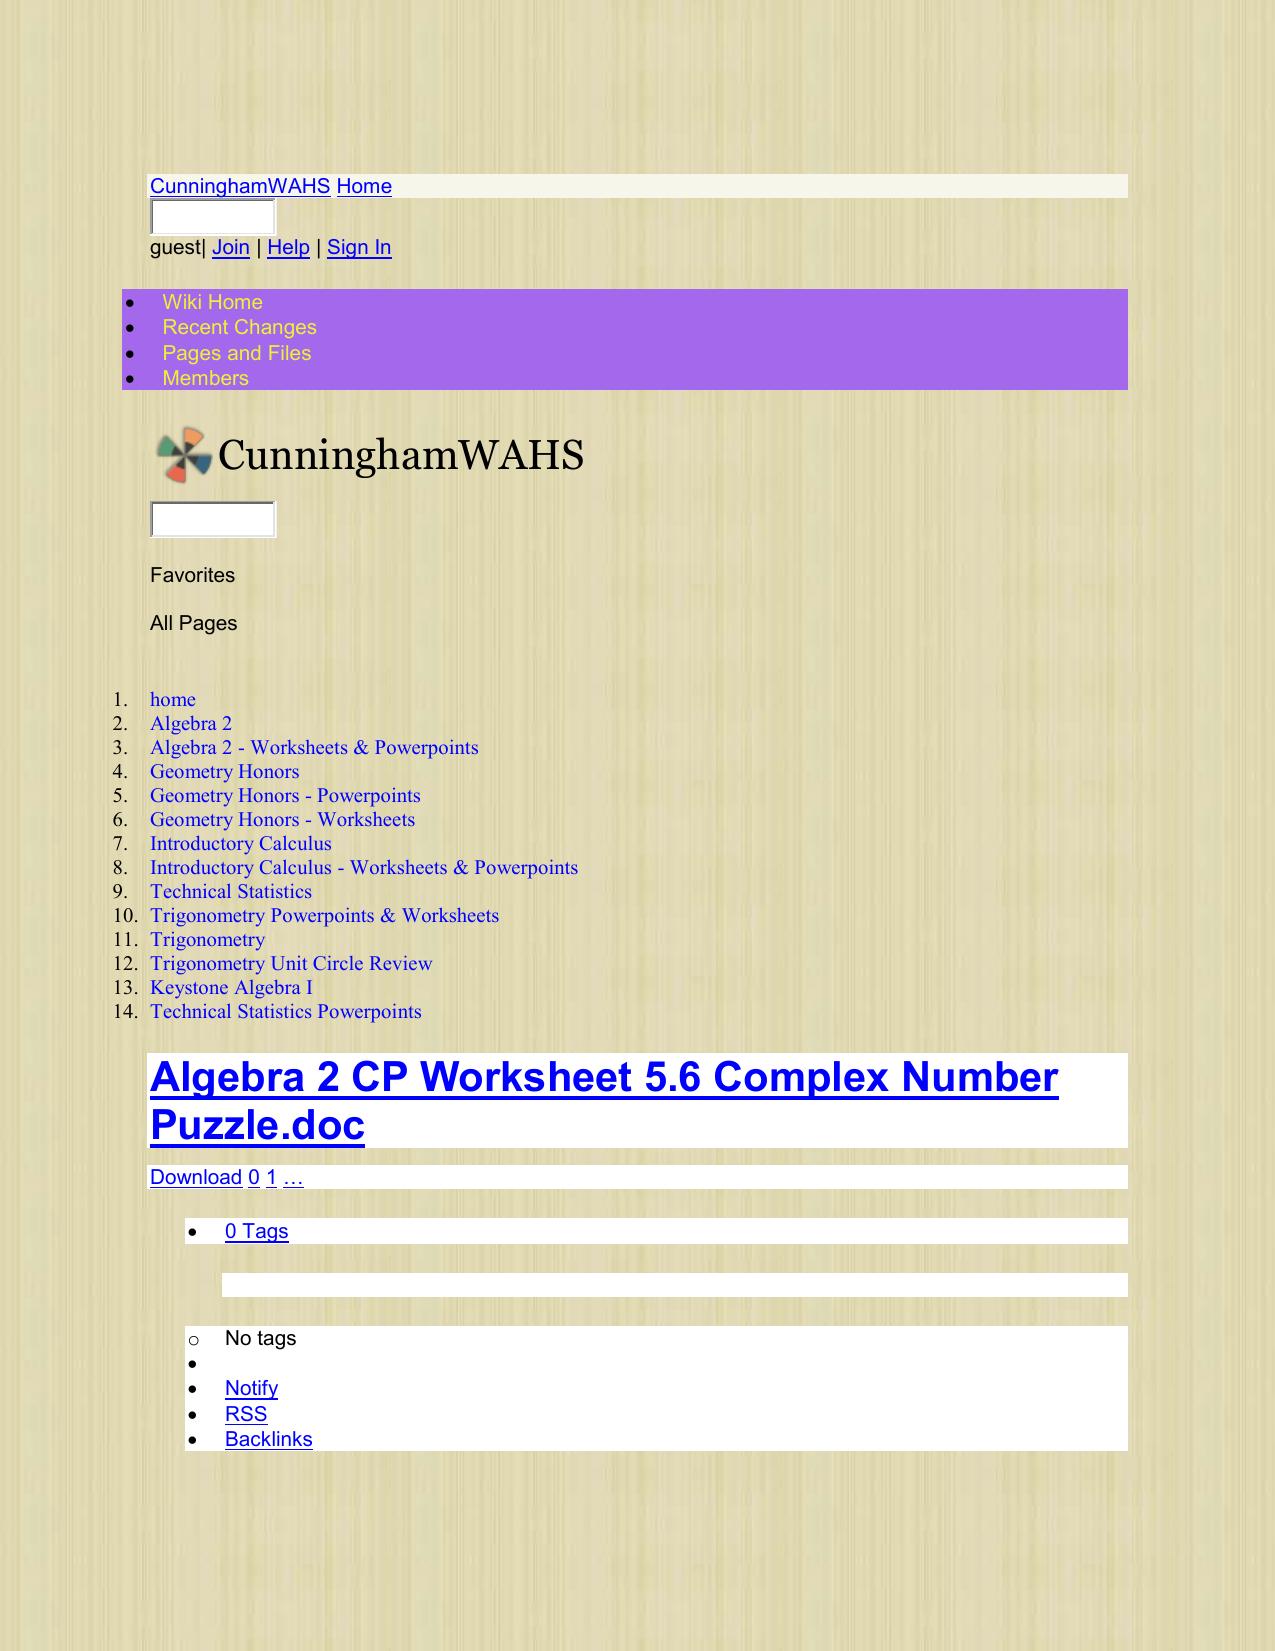 Algebra 2 CP Worksheet 5.6 Complex Number Puzzle